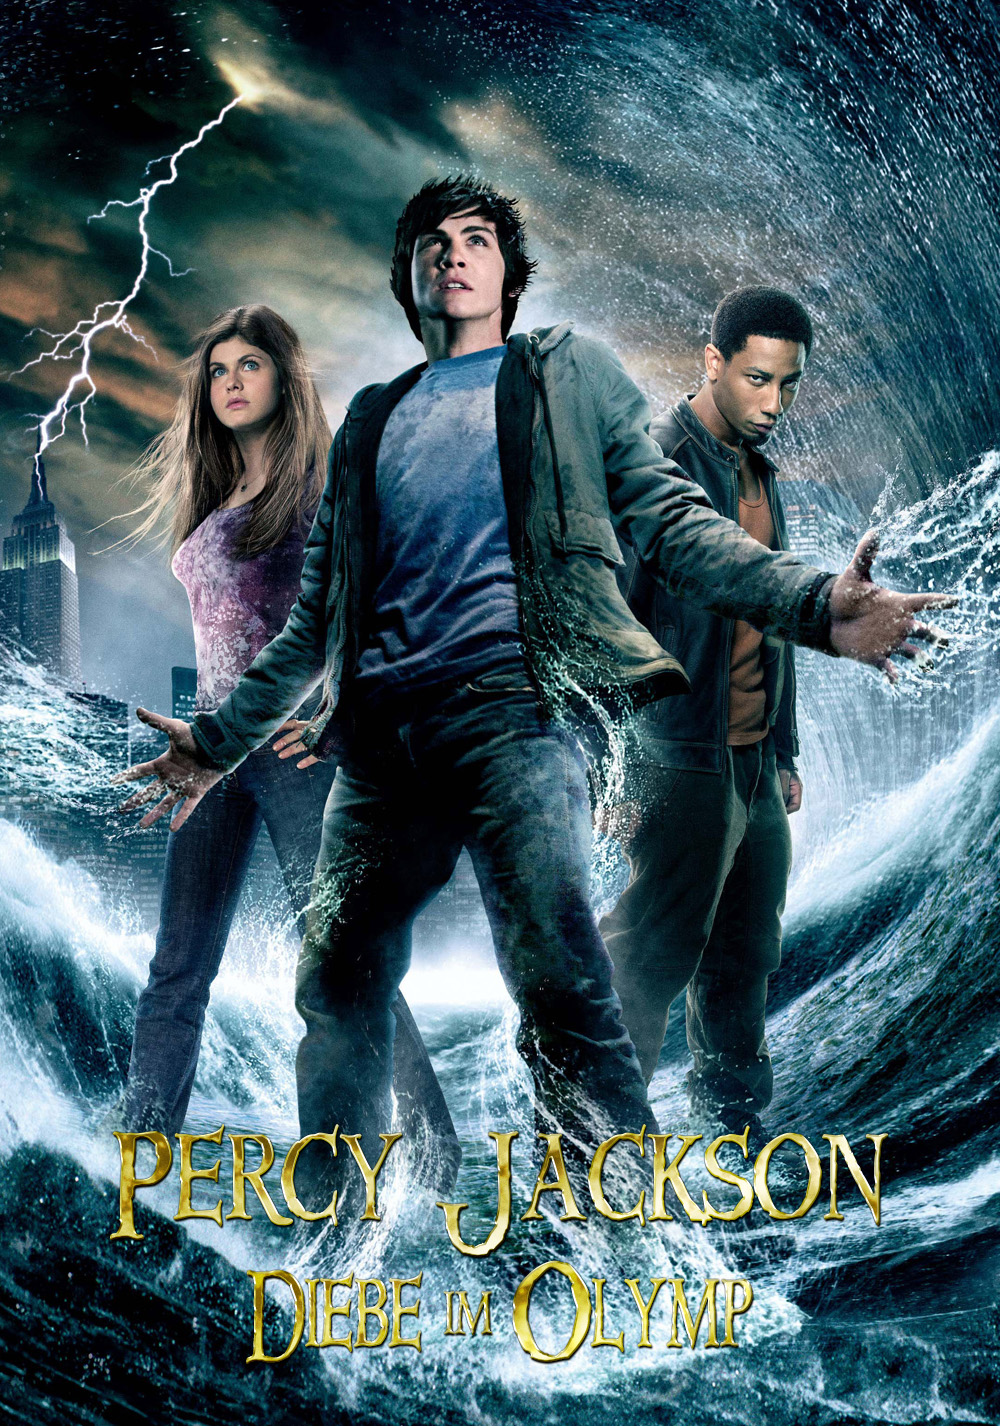 Percy Jackson & the Olympians: The Lightning Thief | Movie ...